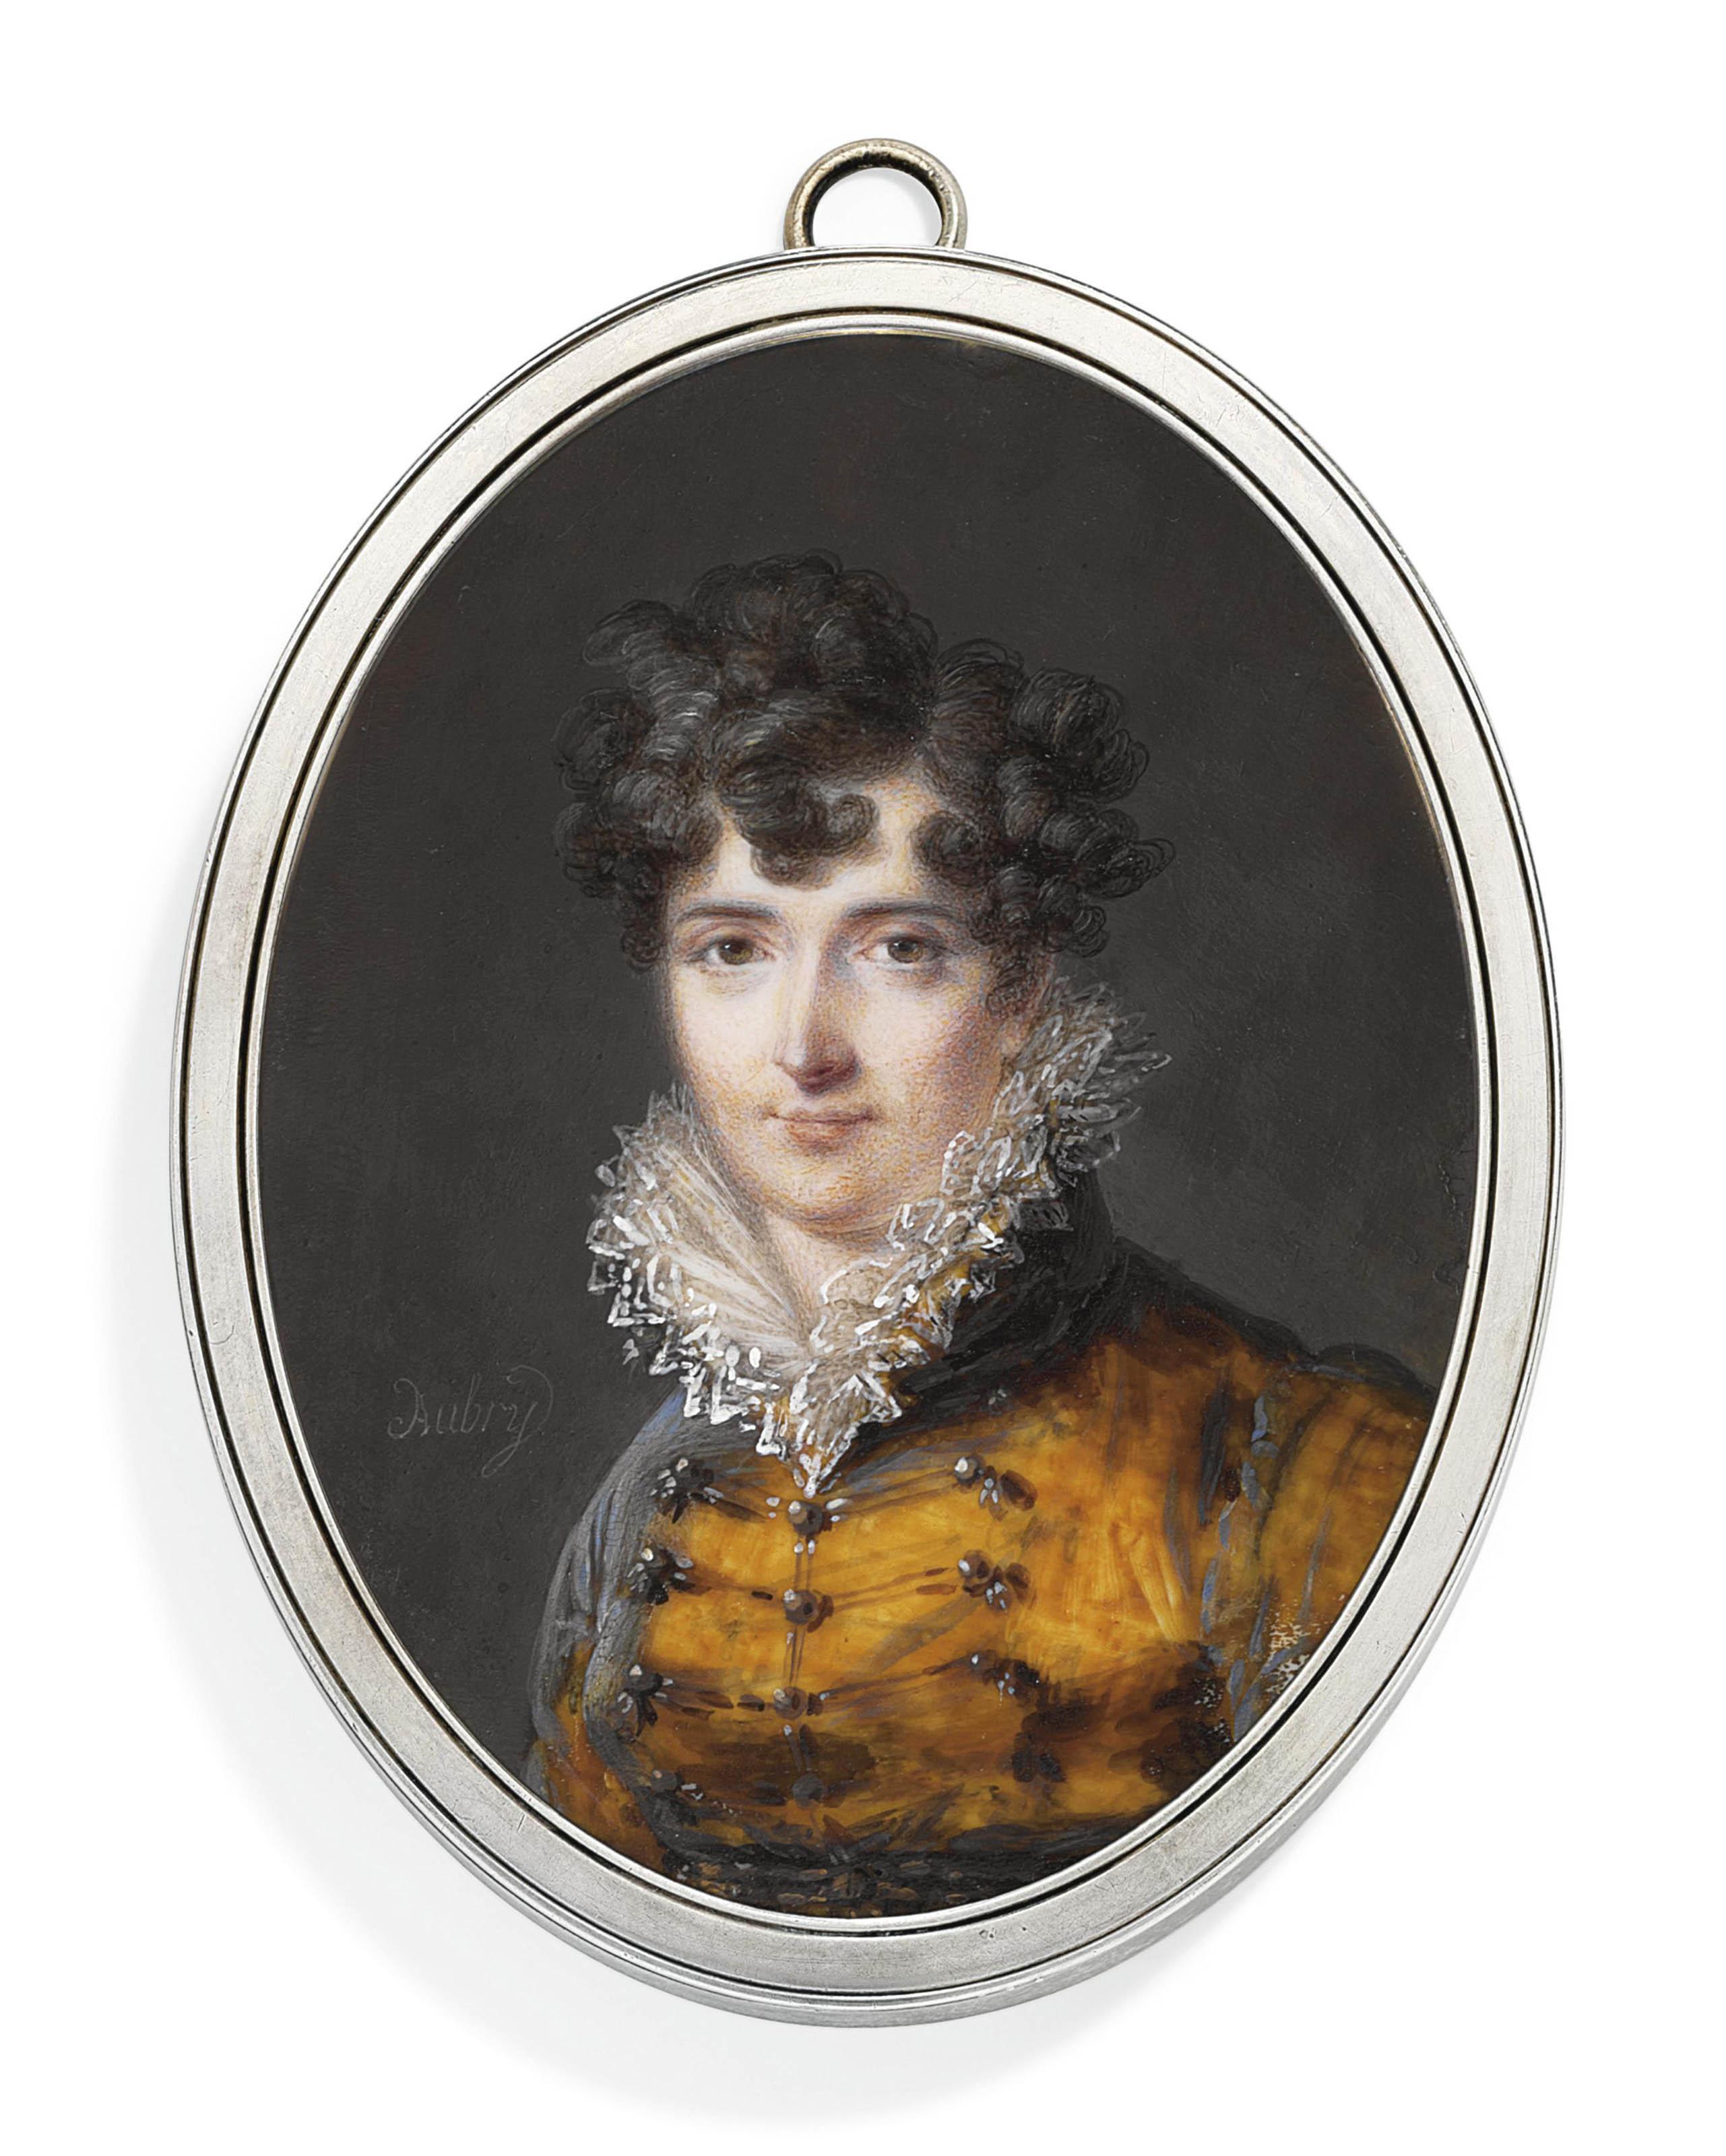 LOUIS-FRANÇOIS AUBRY (FRENCH, 1767-1851)